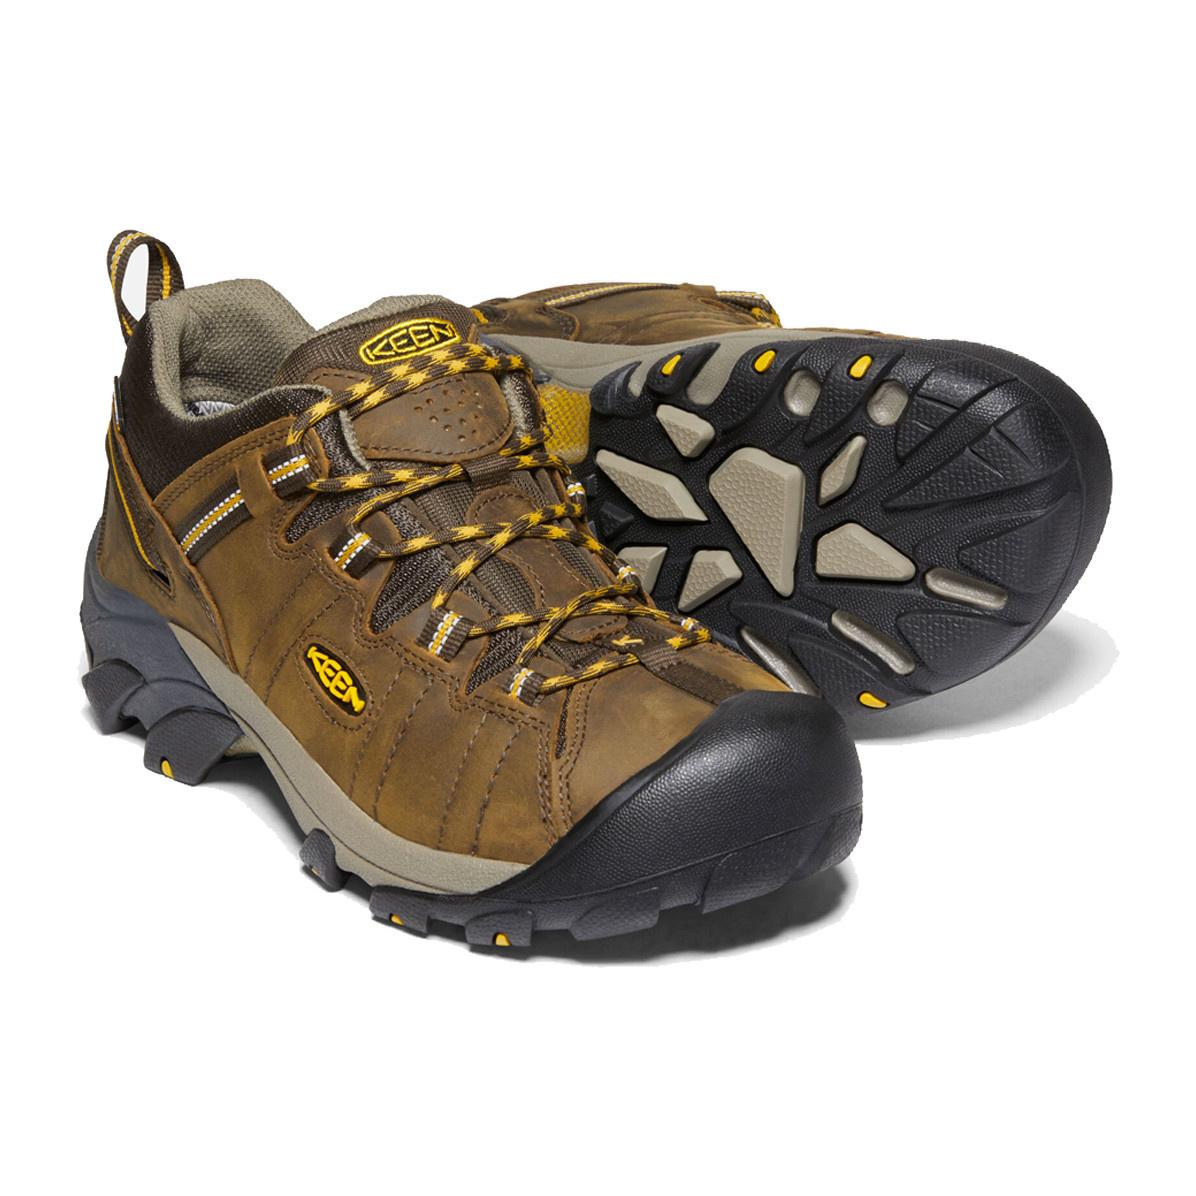 Keen Keen Men's Targhee II Waterproof Cascade Brown